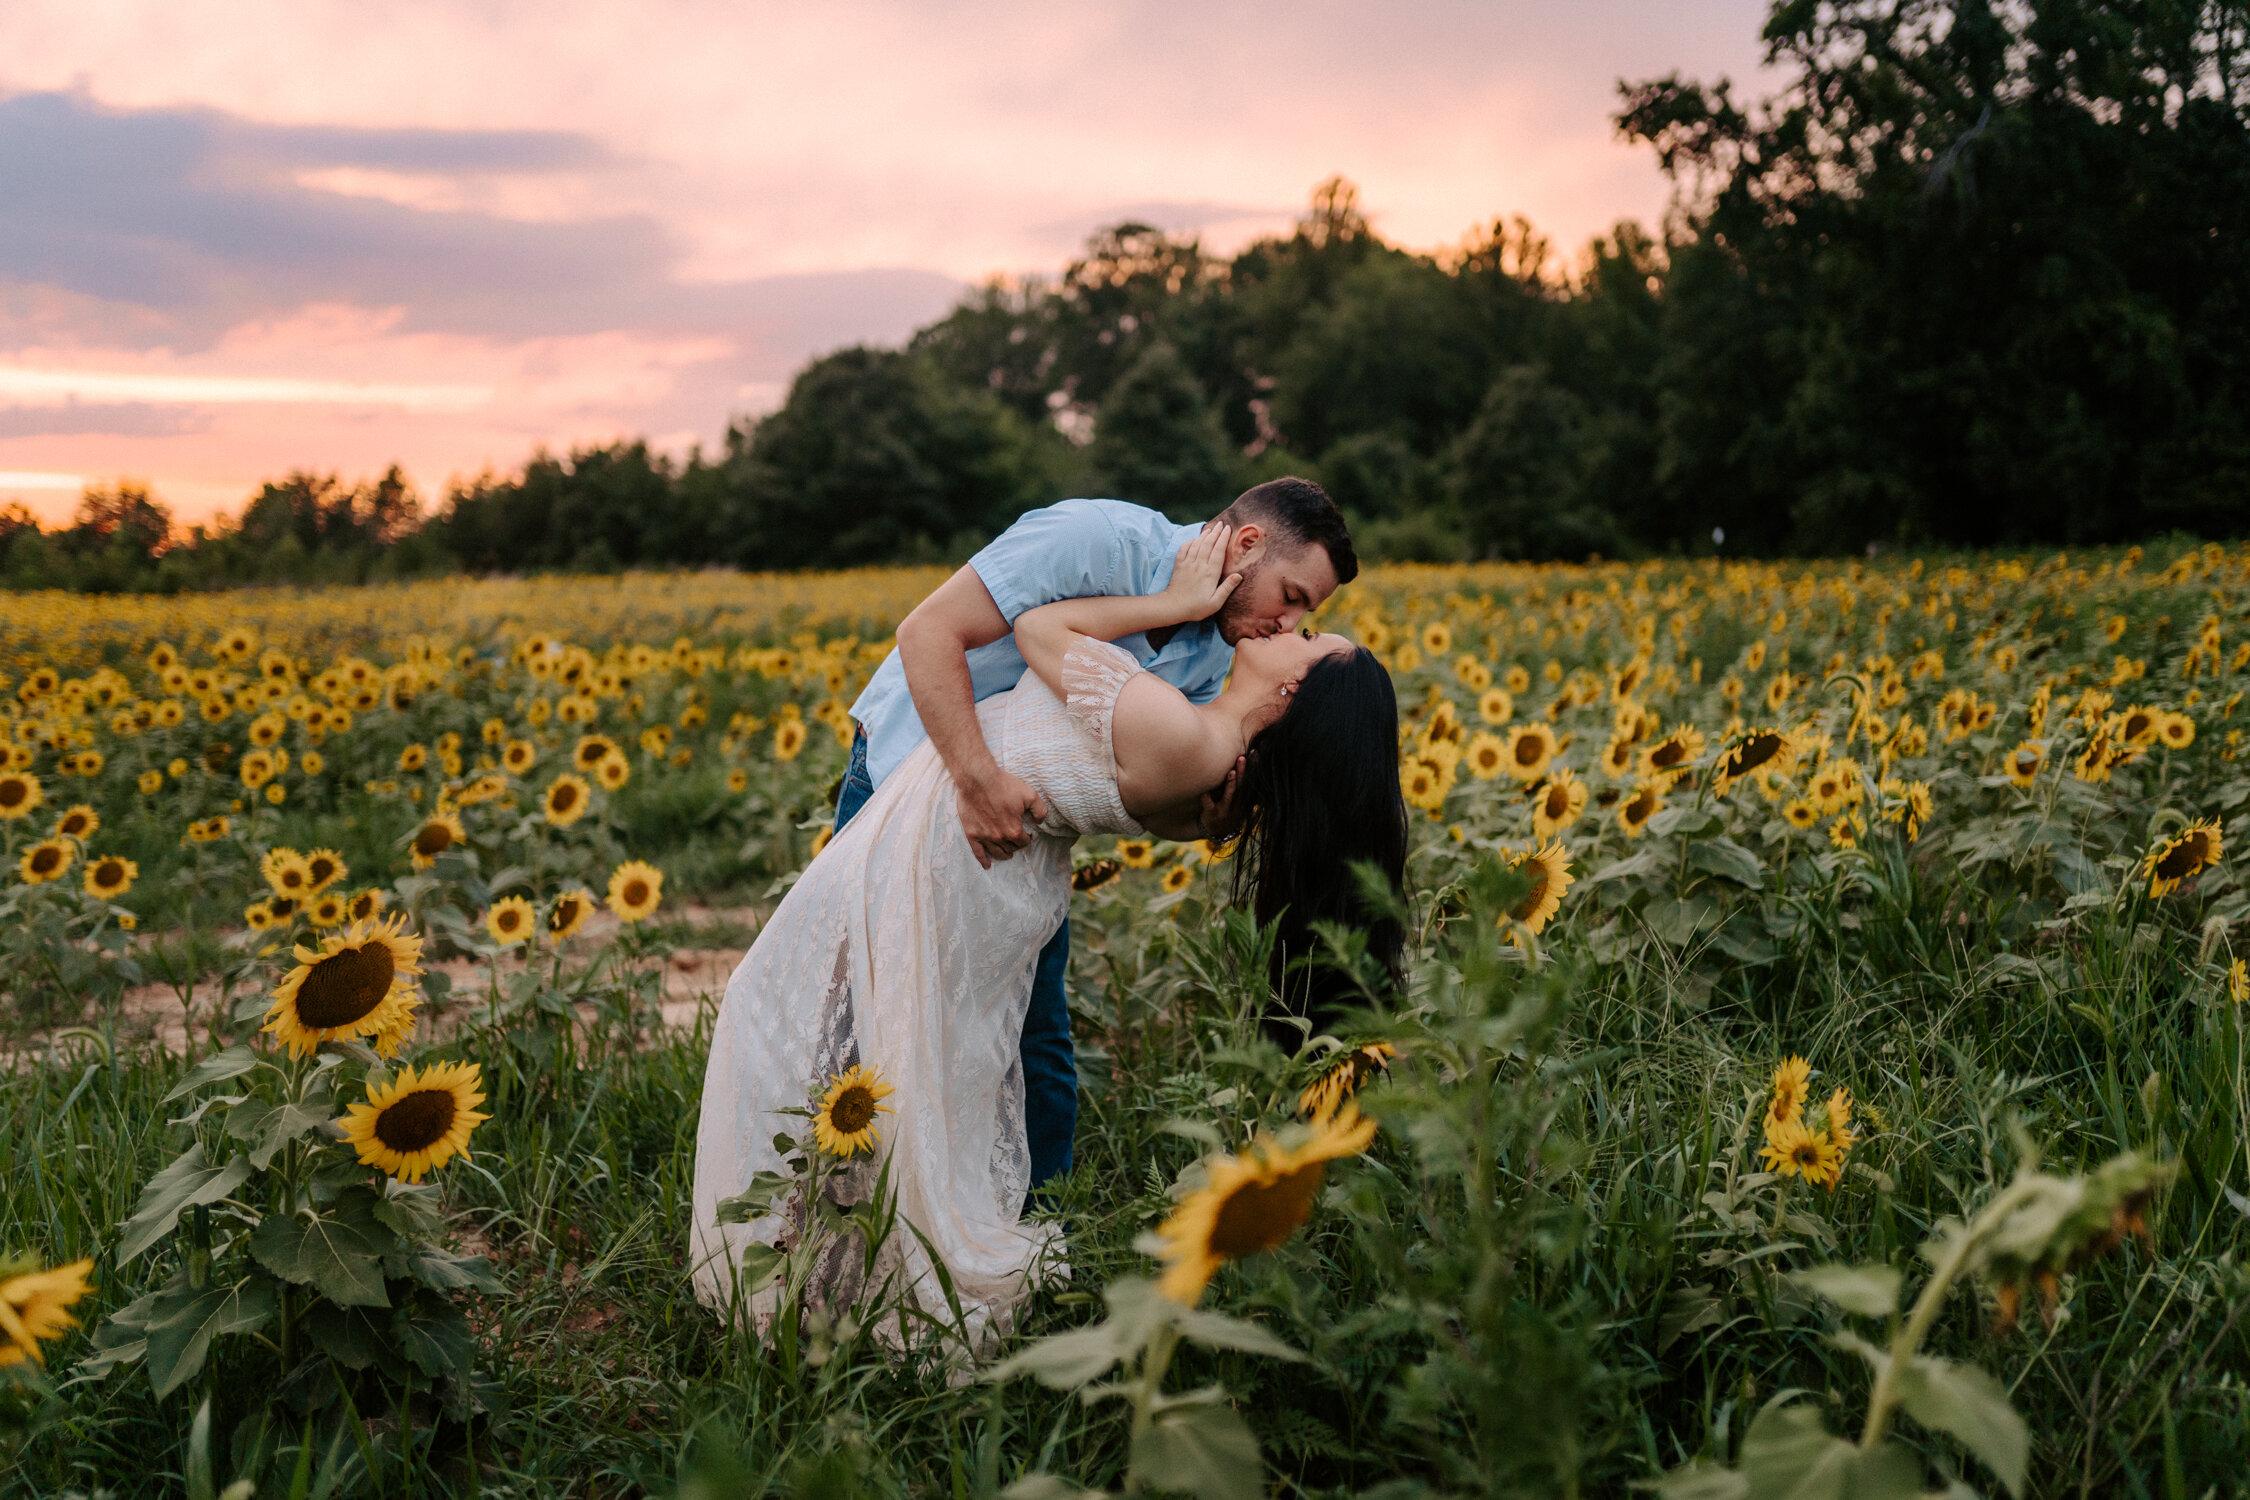 Belews Creek, NC Sunflower Session at Sunset by Kayli LaFon Photography | Dogwood Farms | North Carolina Wedding & Adventurous Photographer